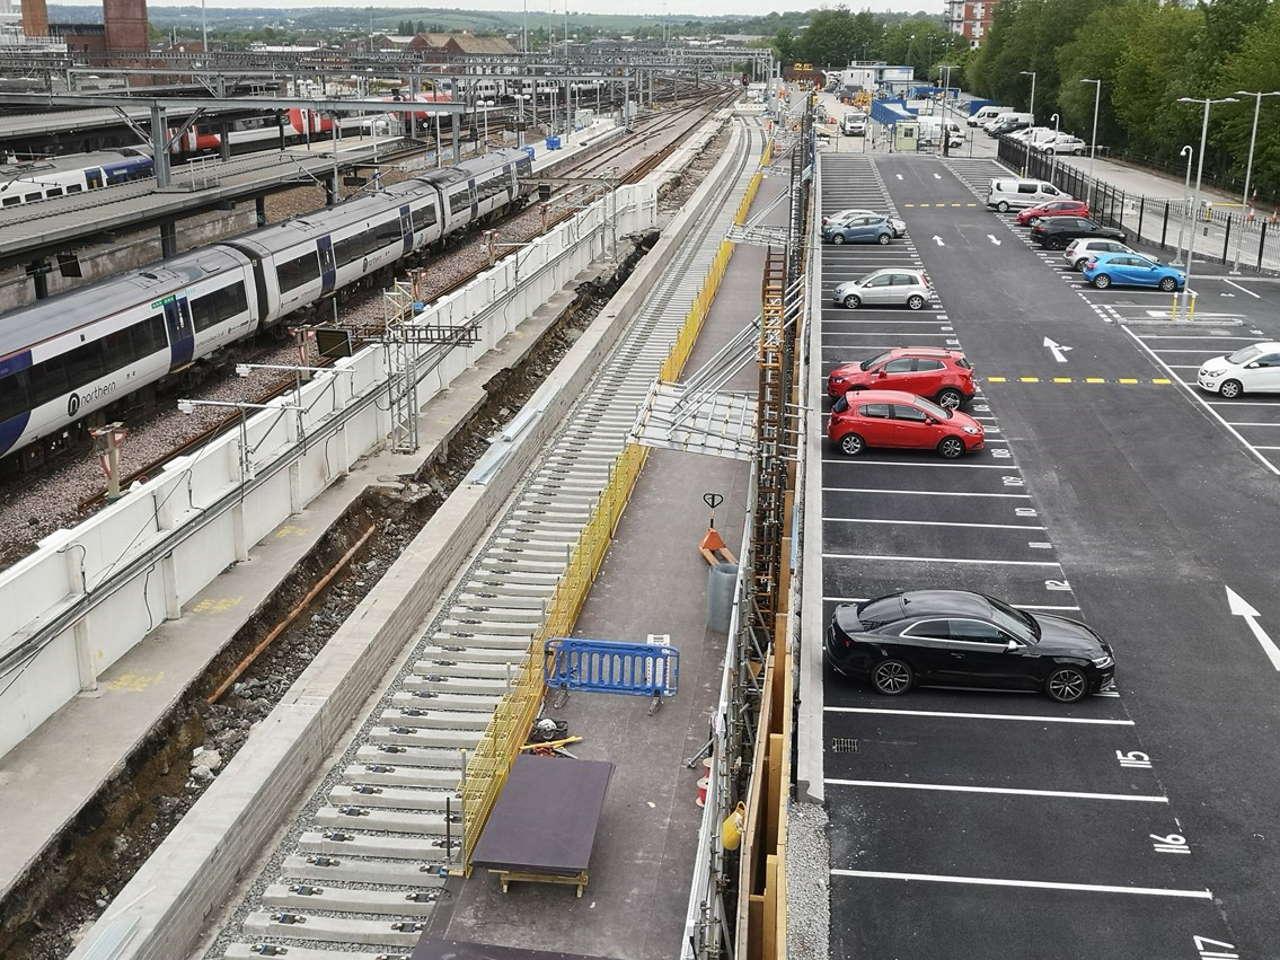 leeds station new platform